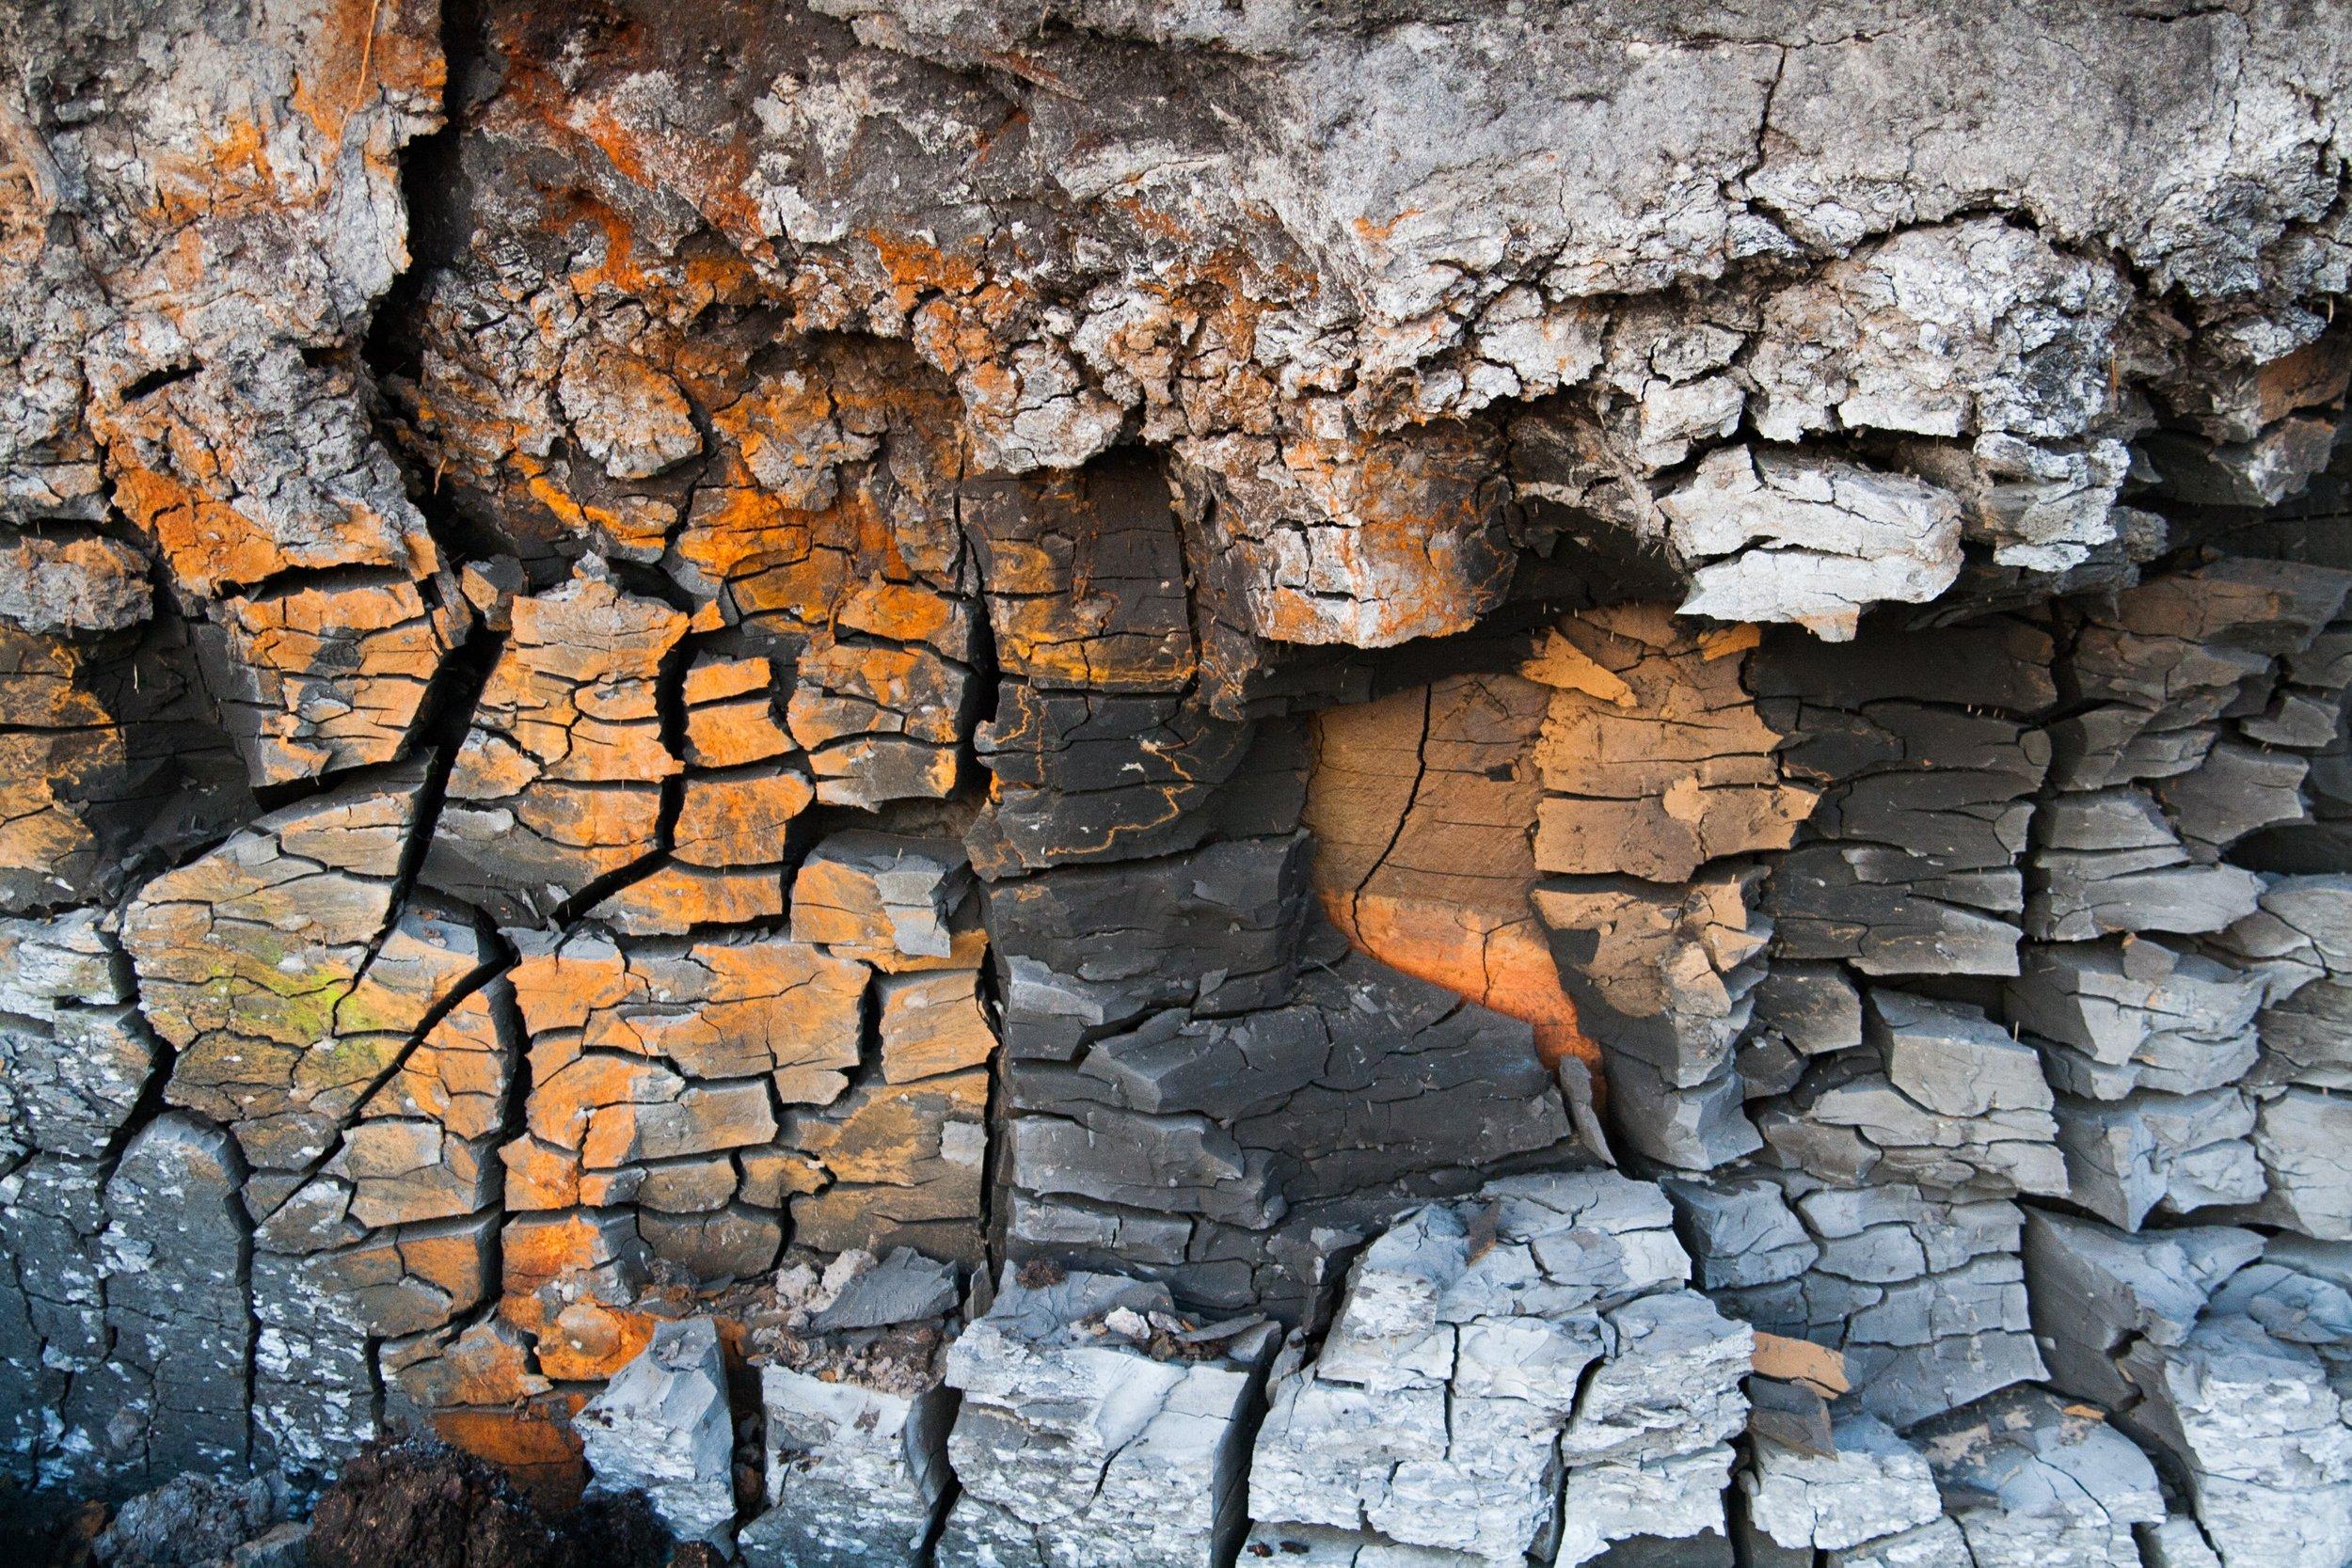 broken-clay-close-up-838981.jpg